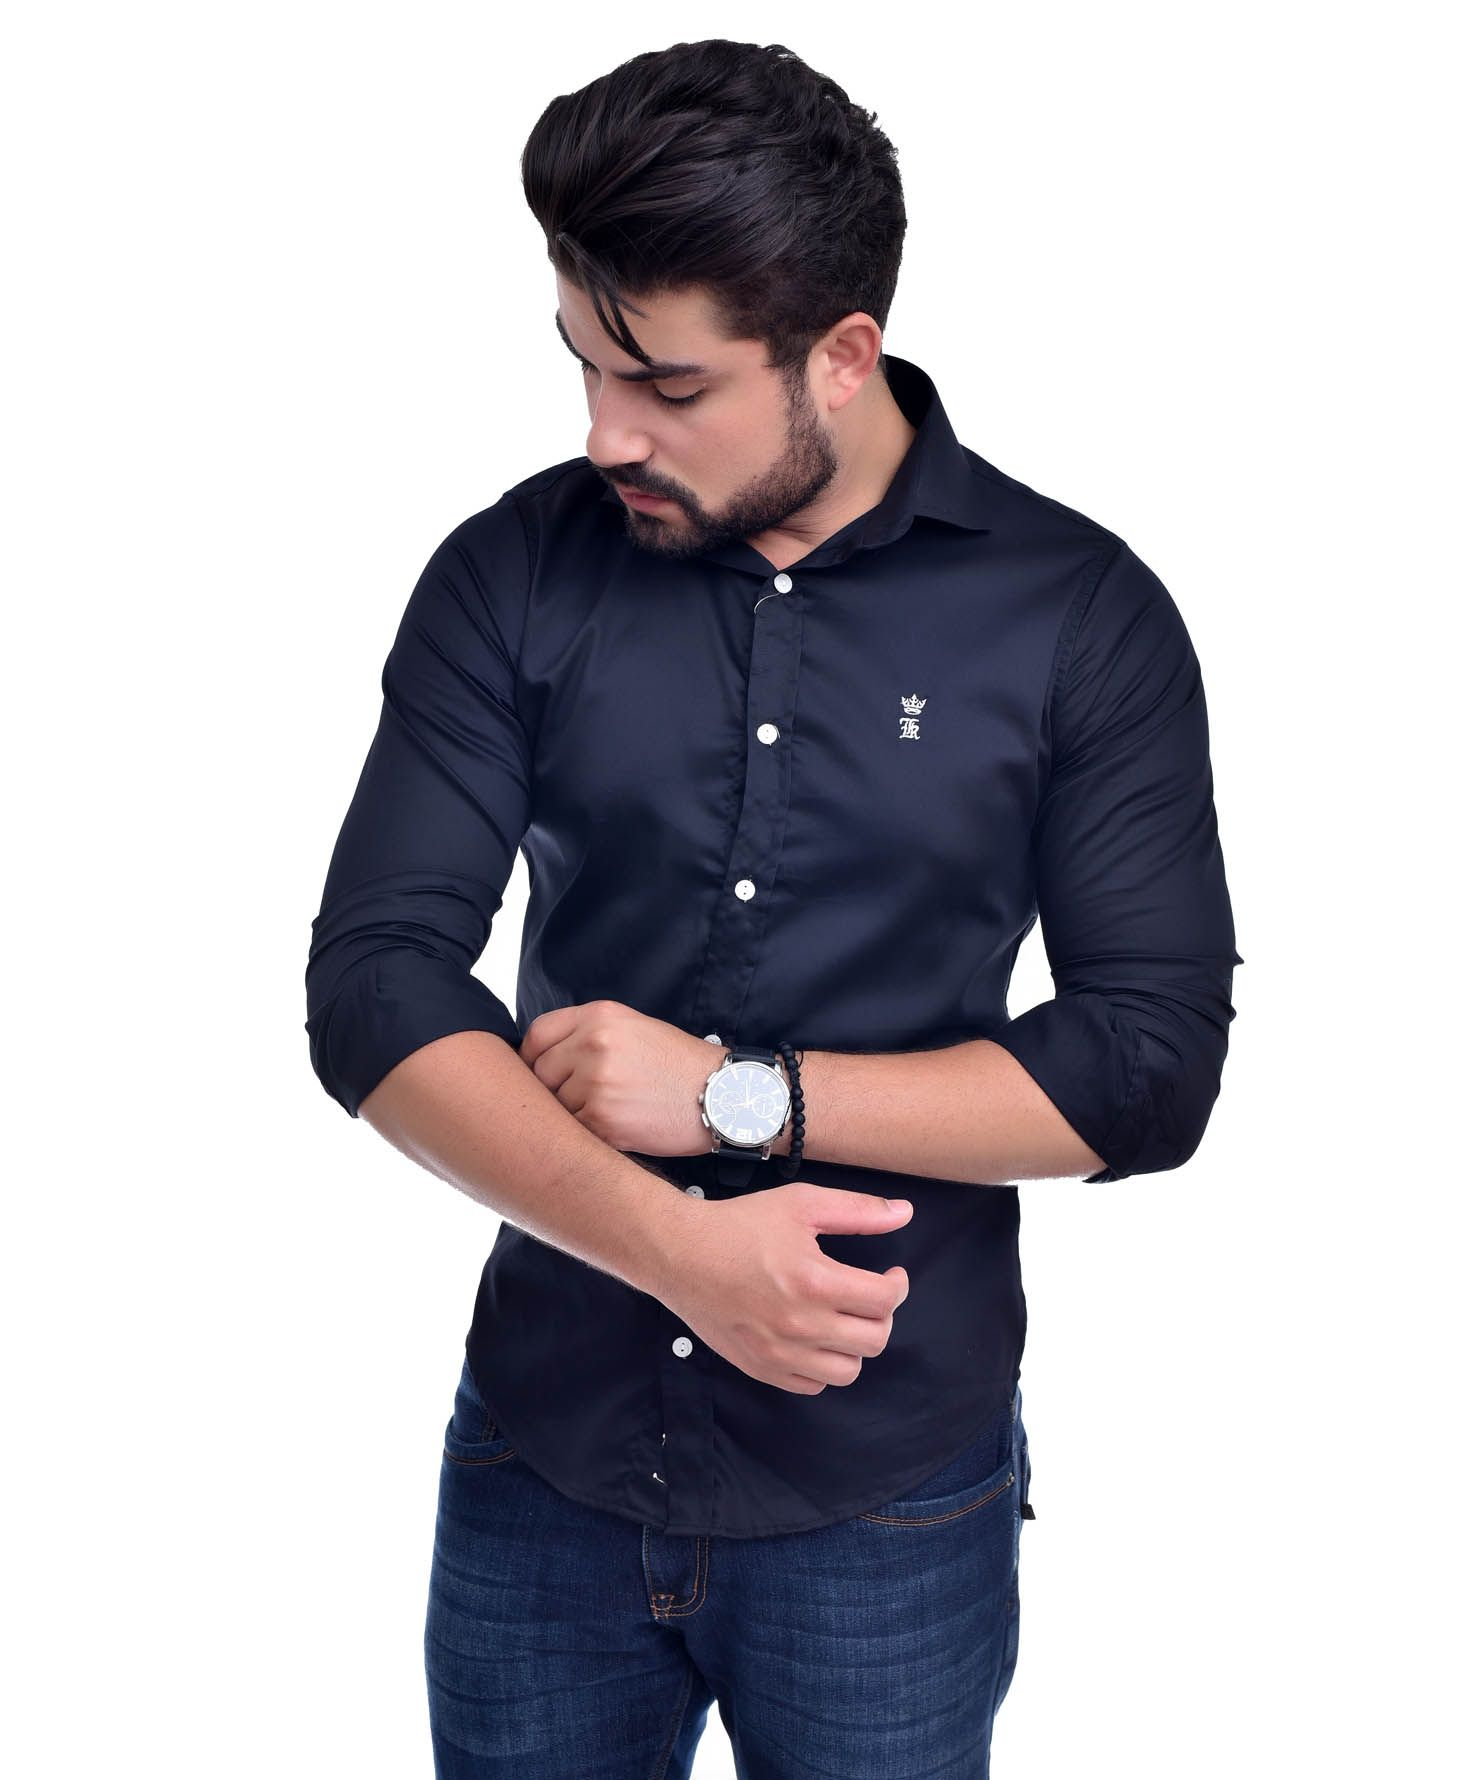 Camisa Social Sergio K Preta Acetinada  - Ca Brasileira